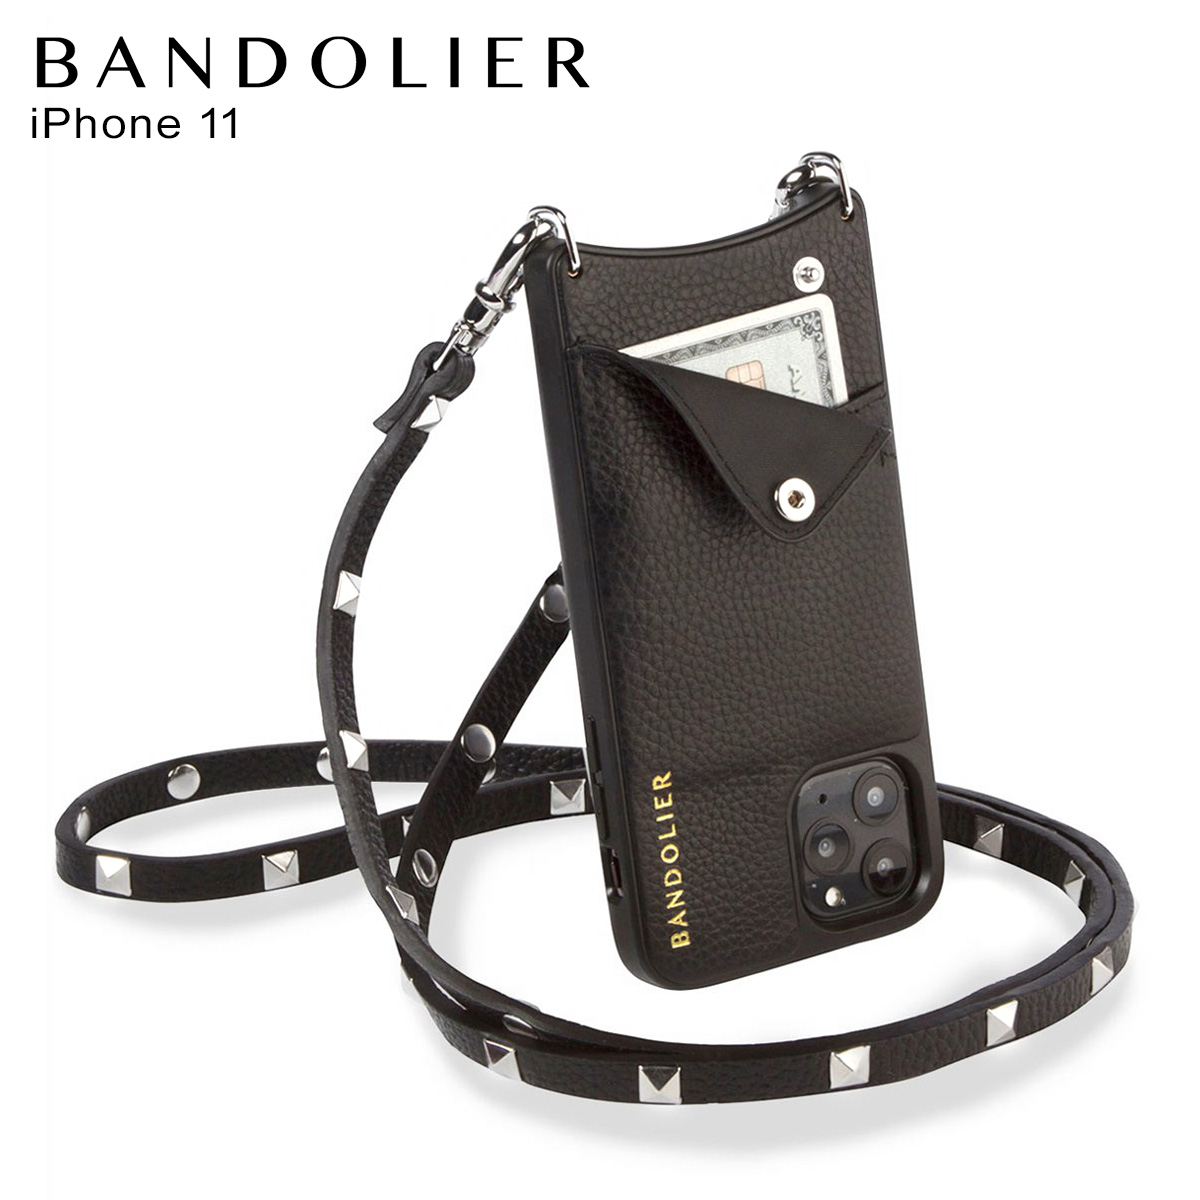 BANDOLIER SARAH SILVER バンドリヤー サラ シルバー iPhone11 ケース スマホ 携帯 ショルダー アイフォン メンズ レディース ブラック 黒 2013